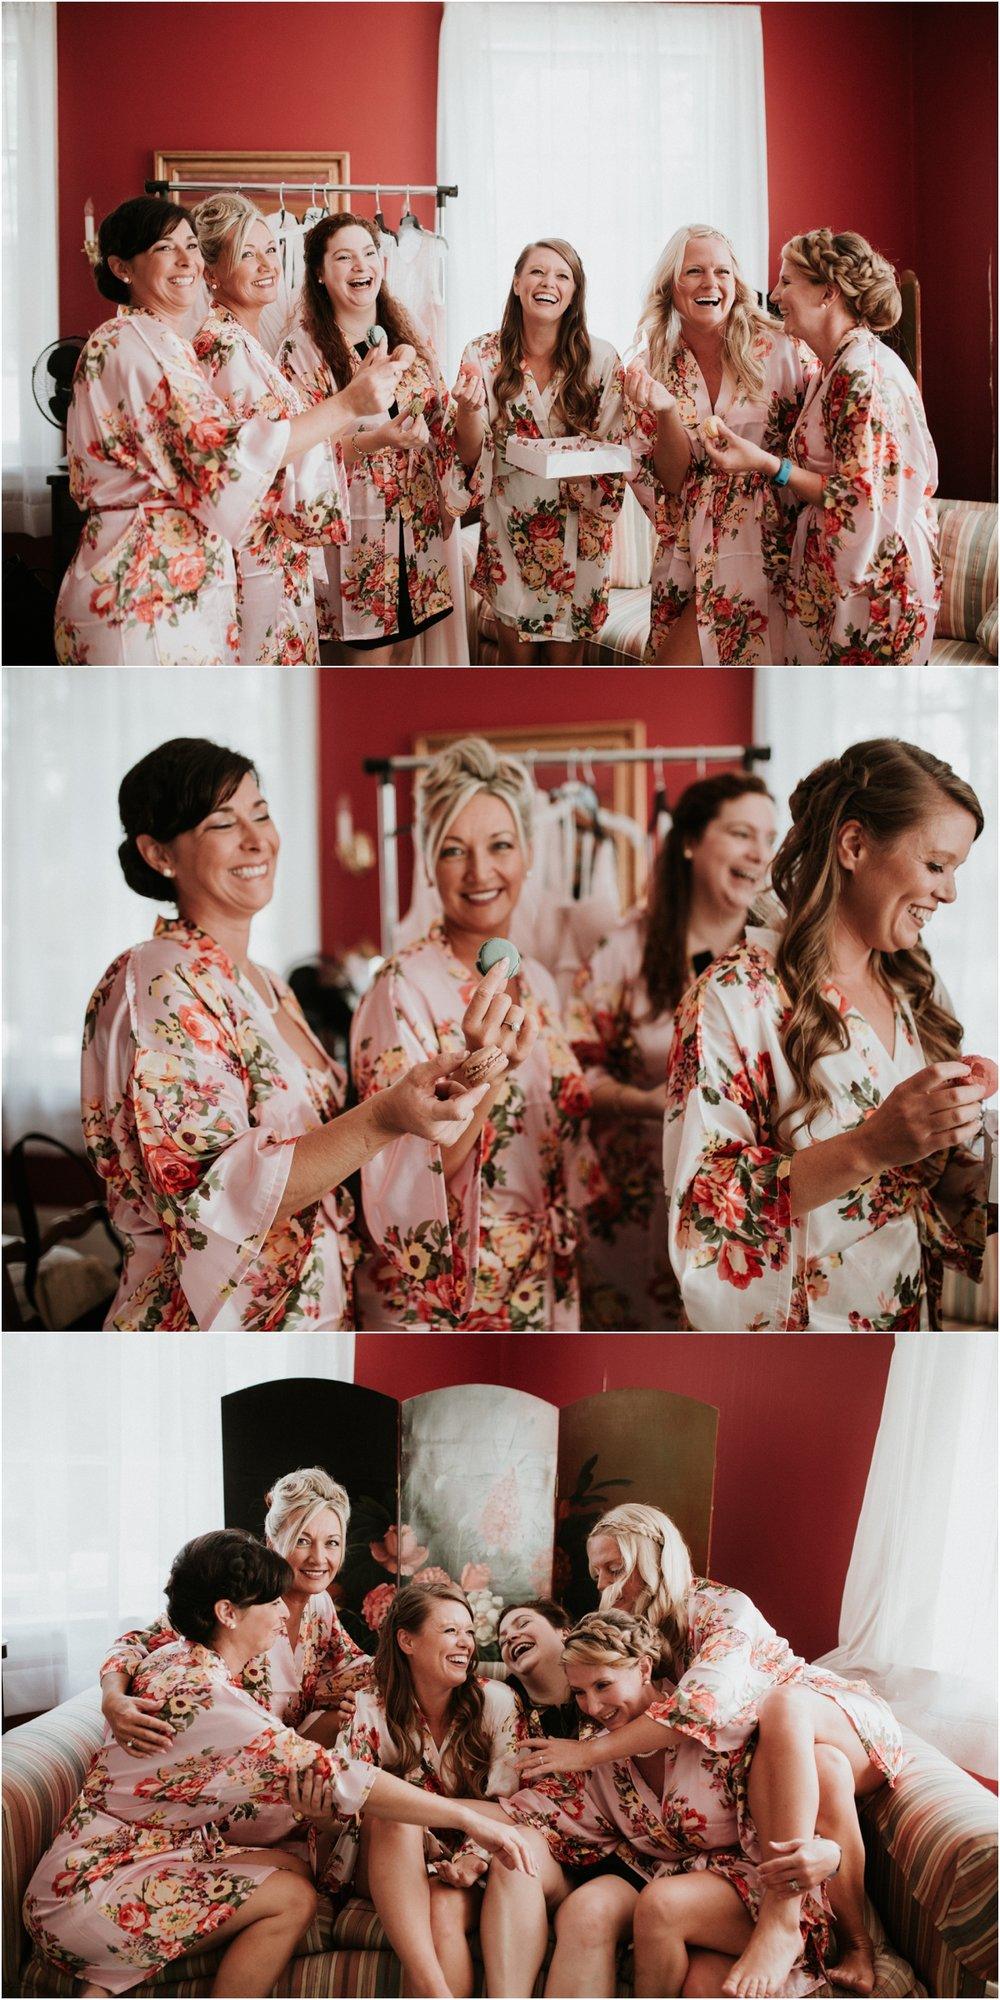 Stowe-manor-wedding-belmont-nc_0004.jpg